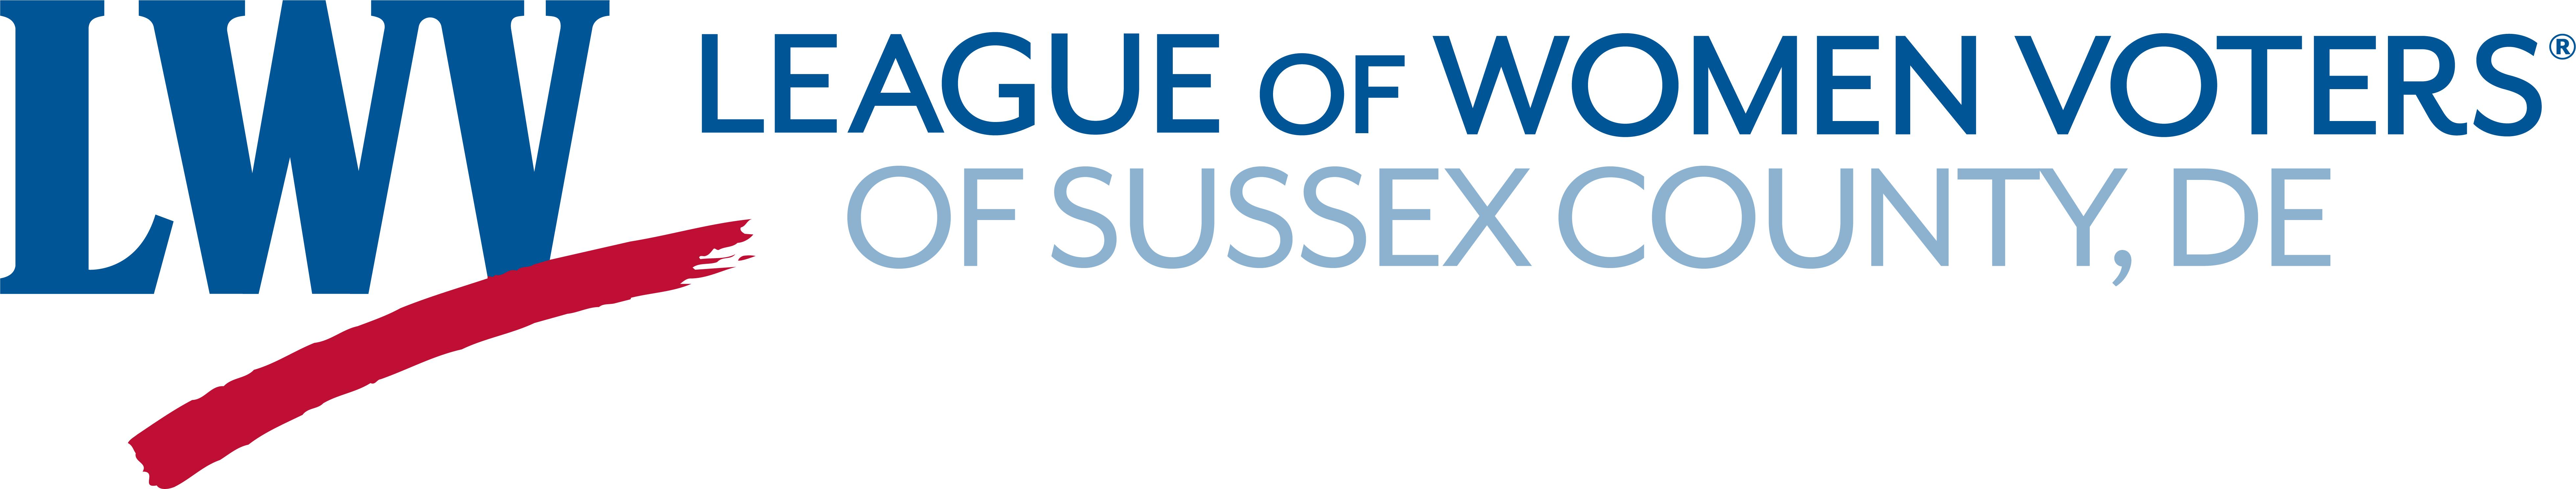 League of Women Voters of Sussex County, DE